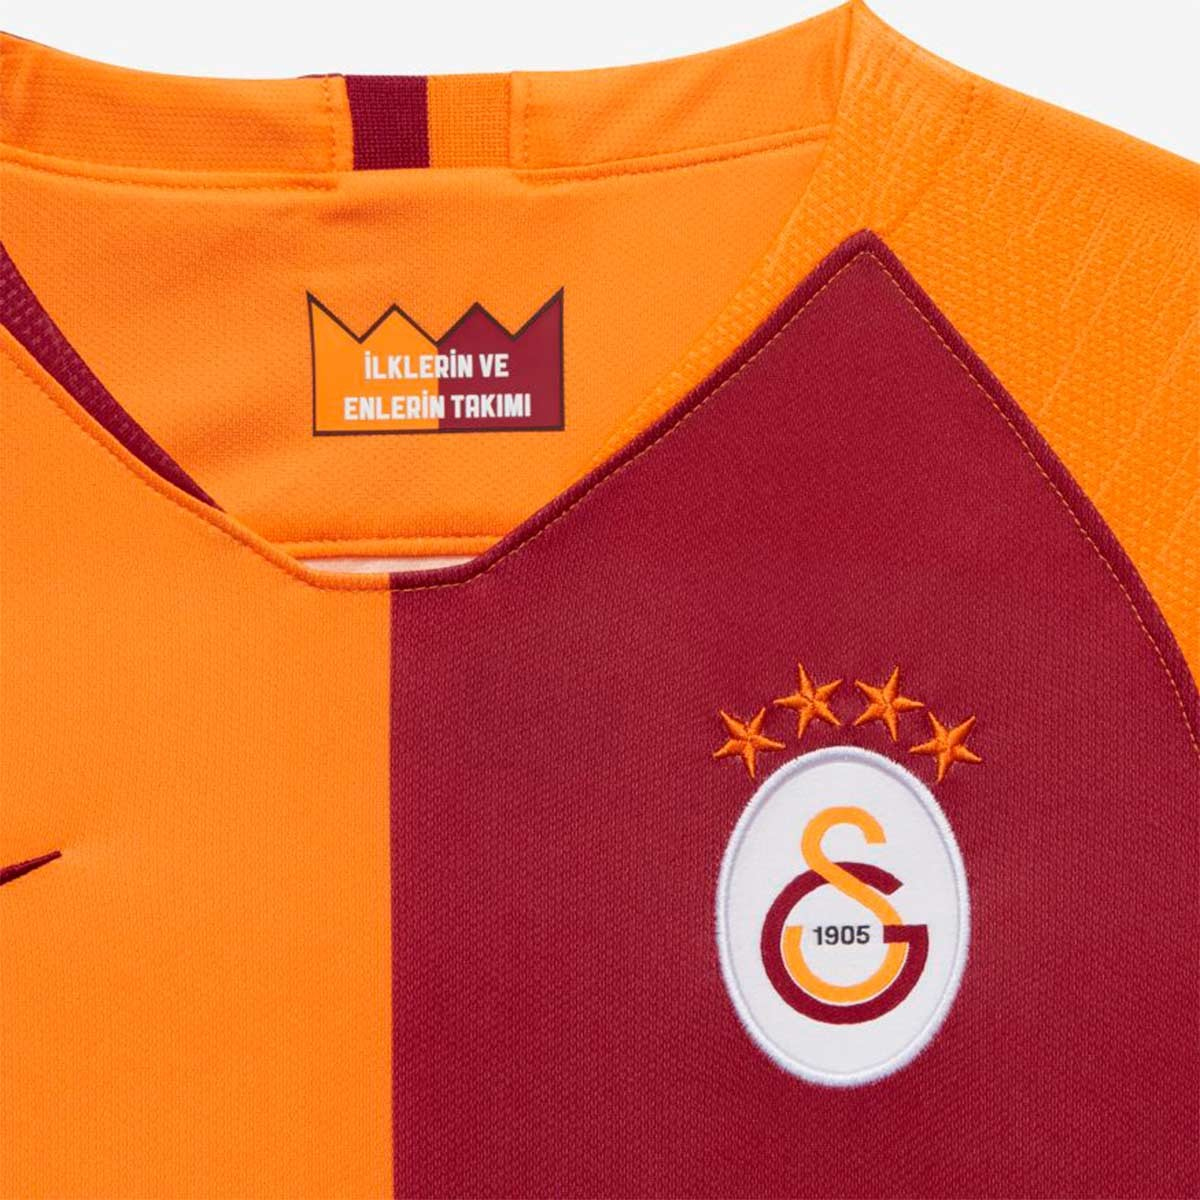 3f2bc8ccec3 Jersey Nike Kids Galatasaray Stadium 2018-2019 Home Vivid orange-Pepper red  - Football store Fútbol Emotion